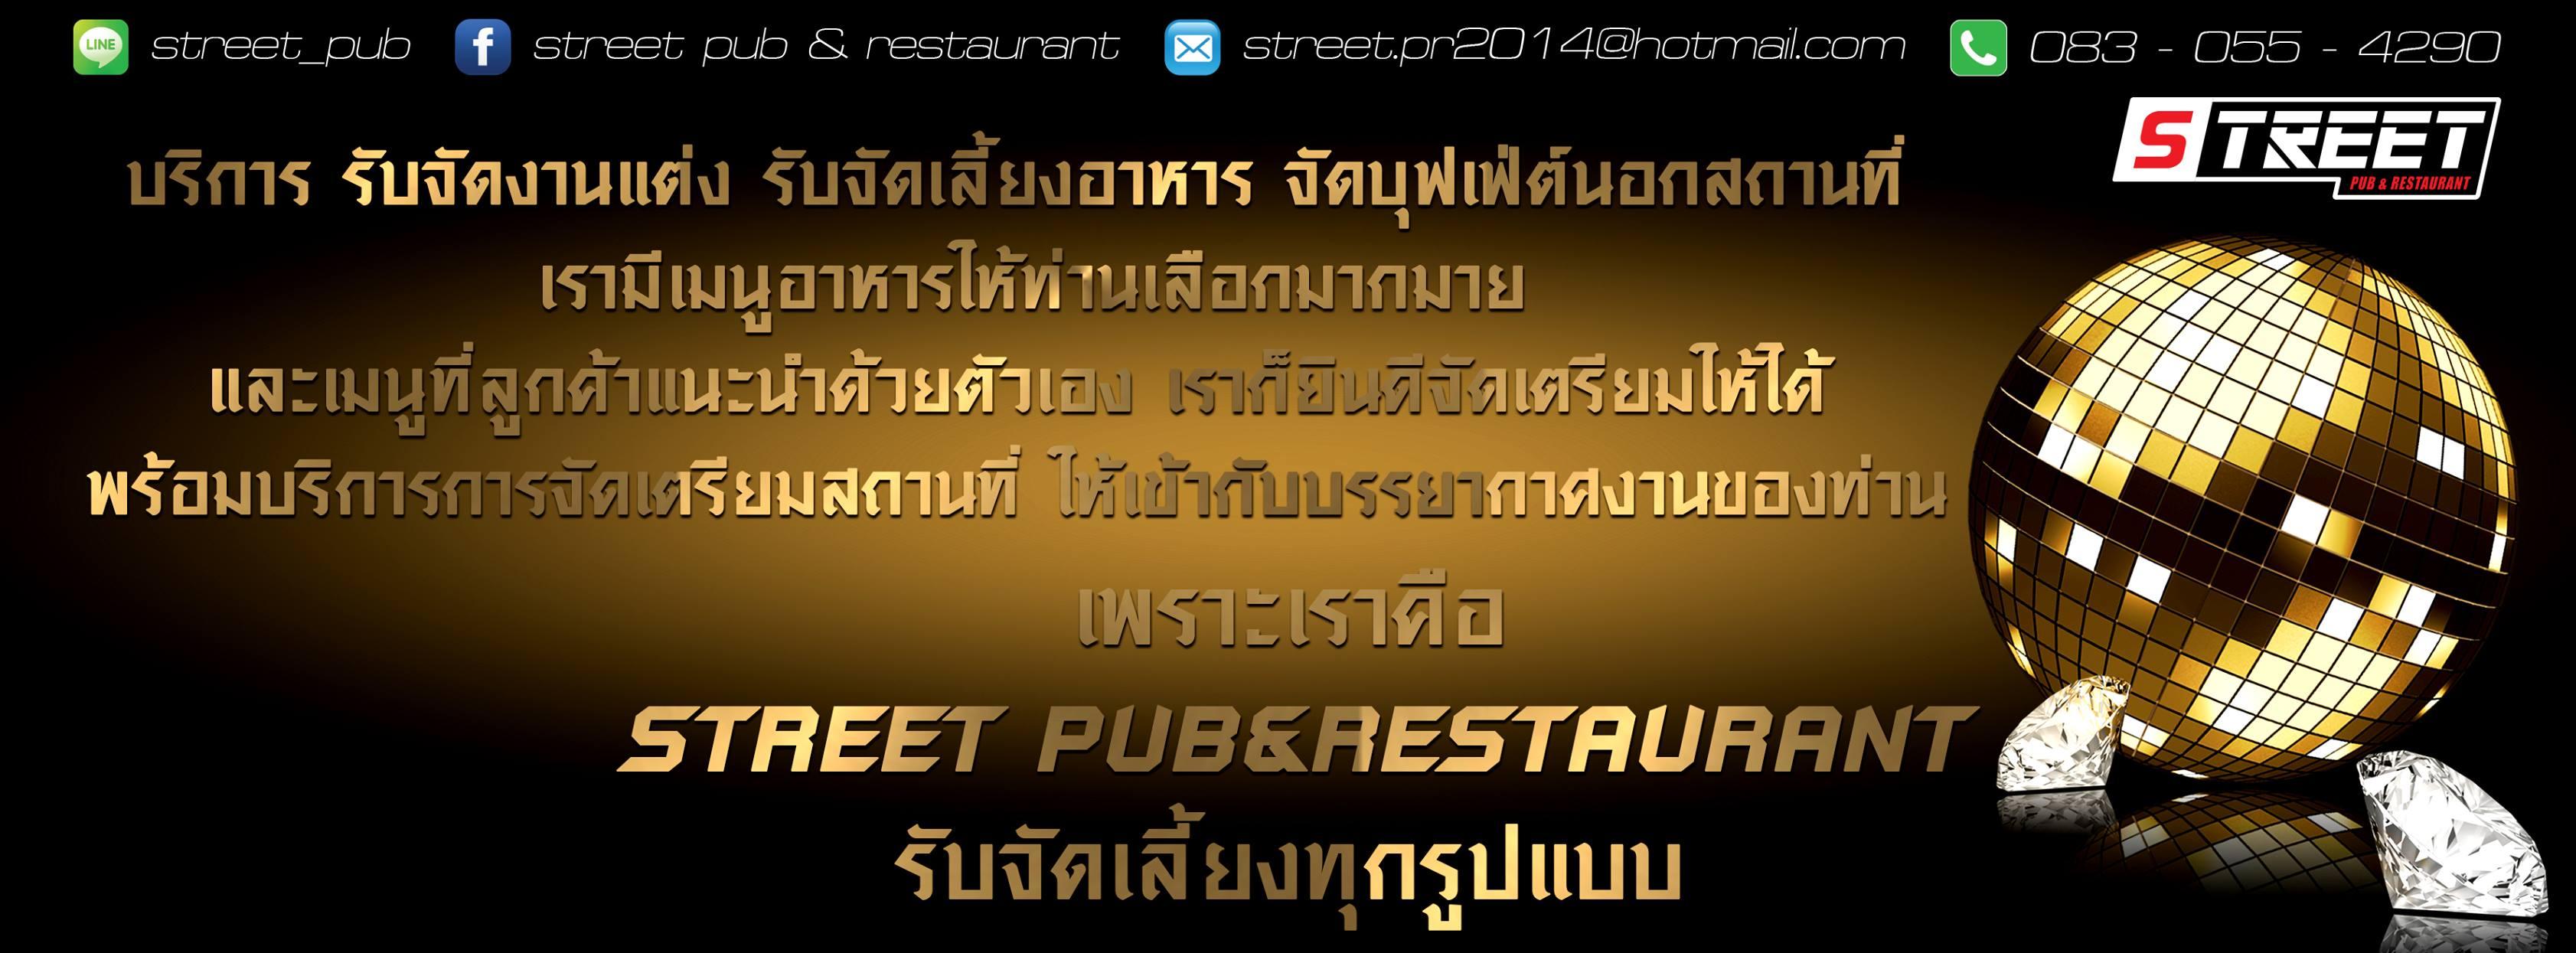 Street Pub&Restaurant